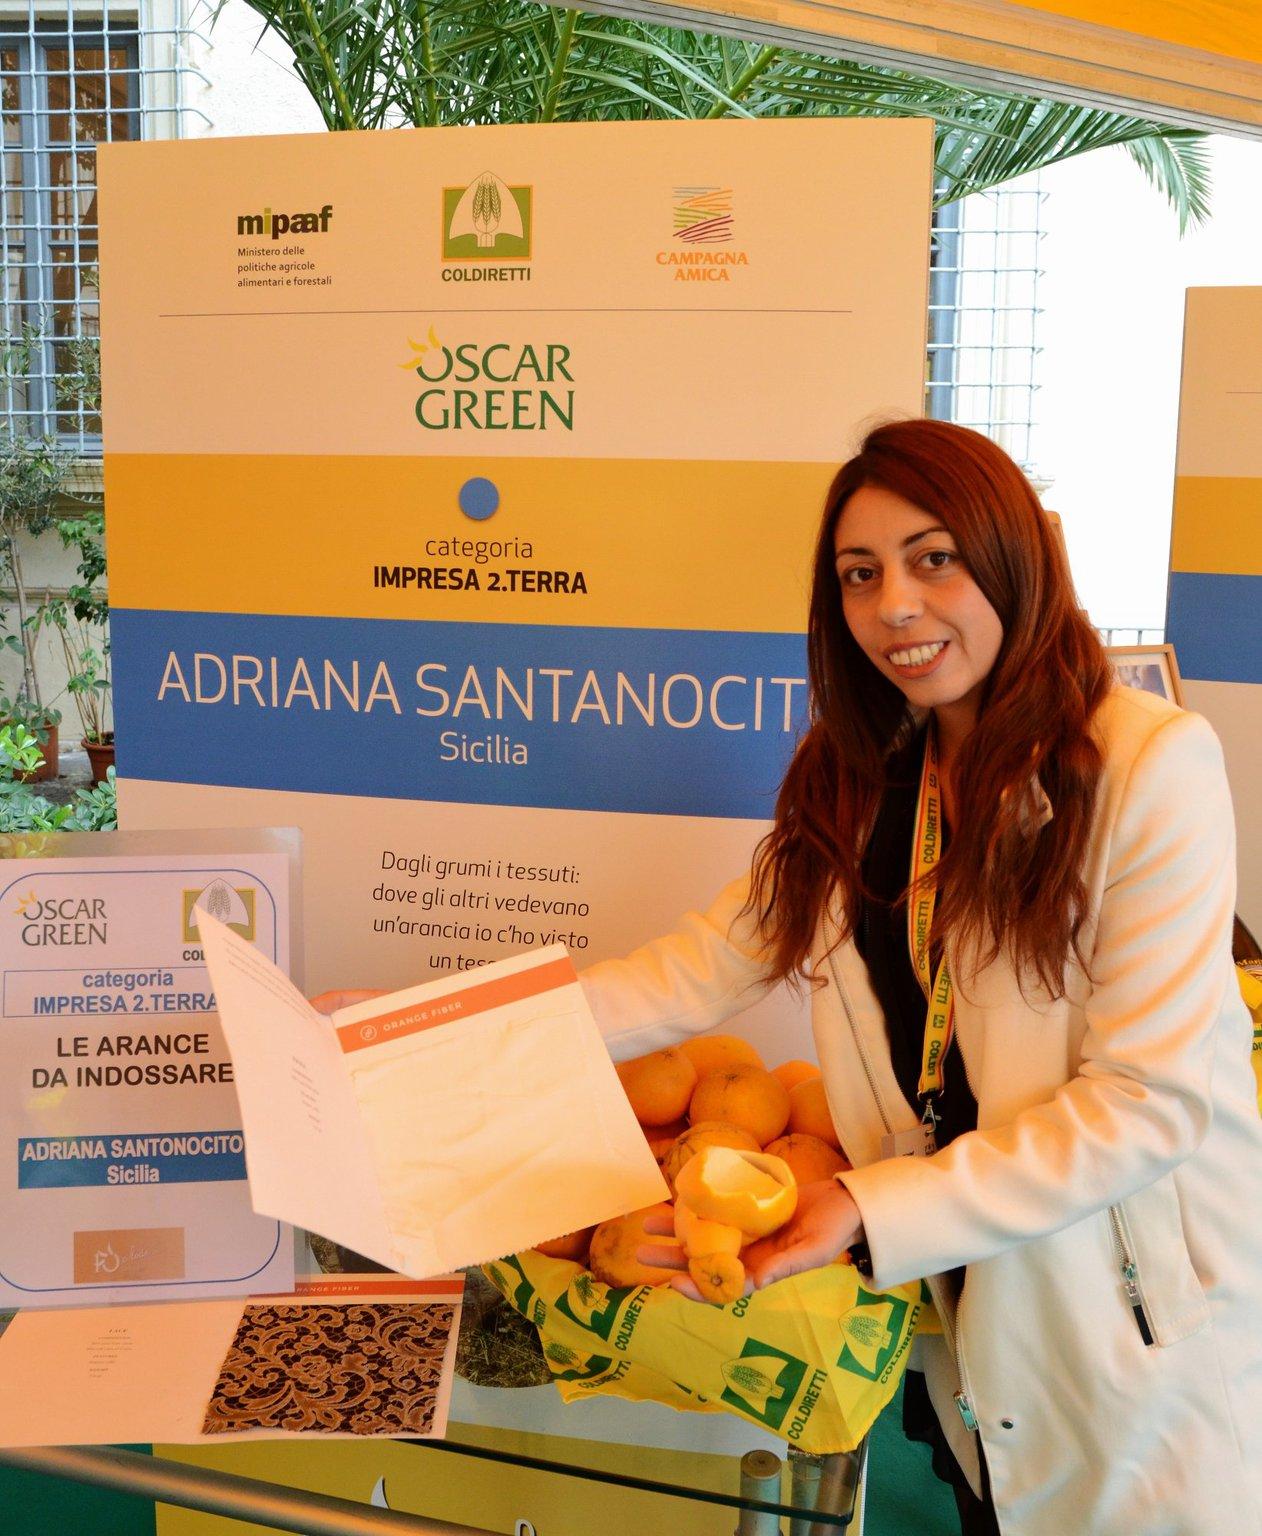 Oscar Green 2016 Adriana Santonocito